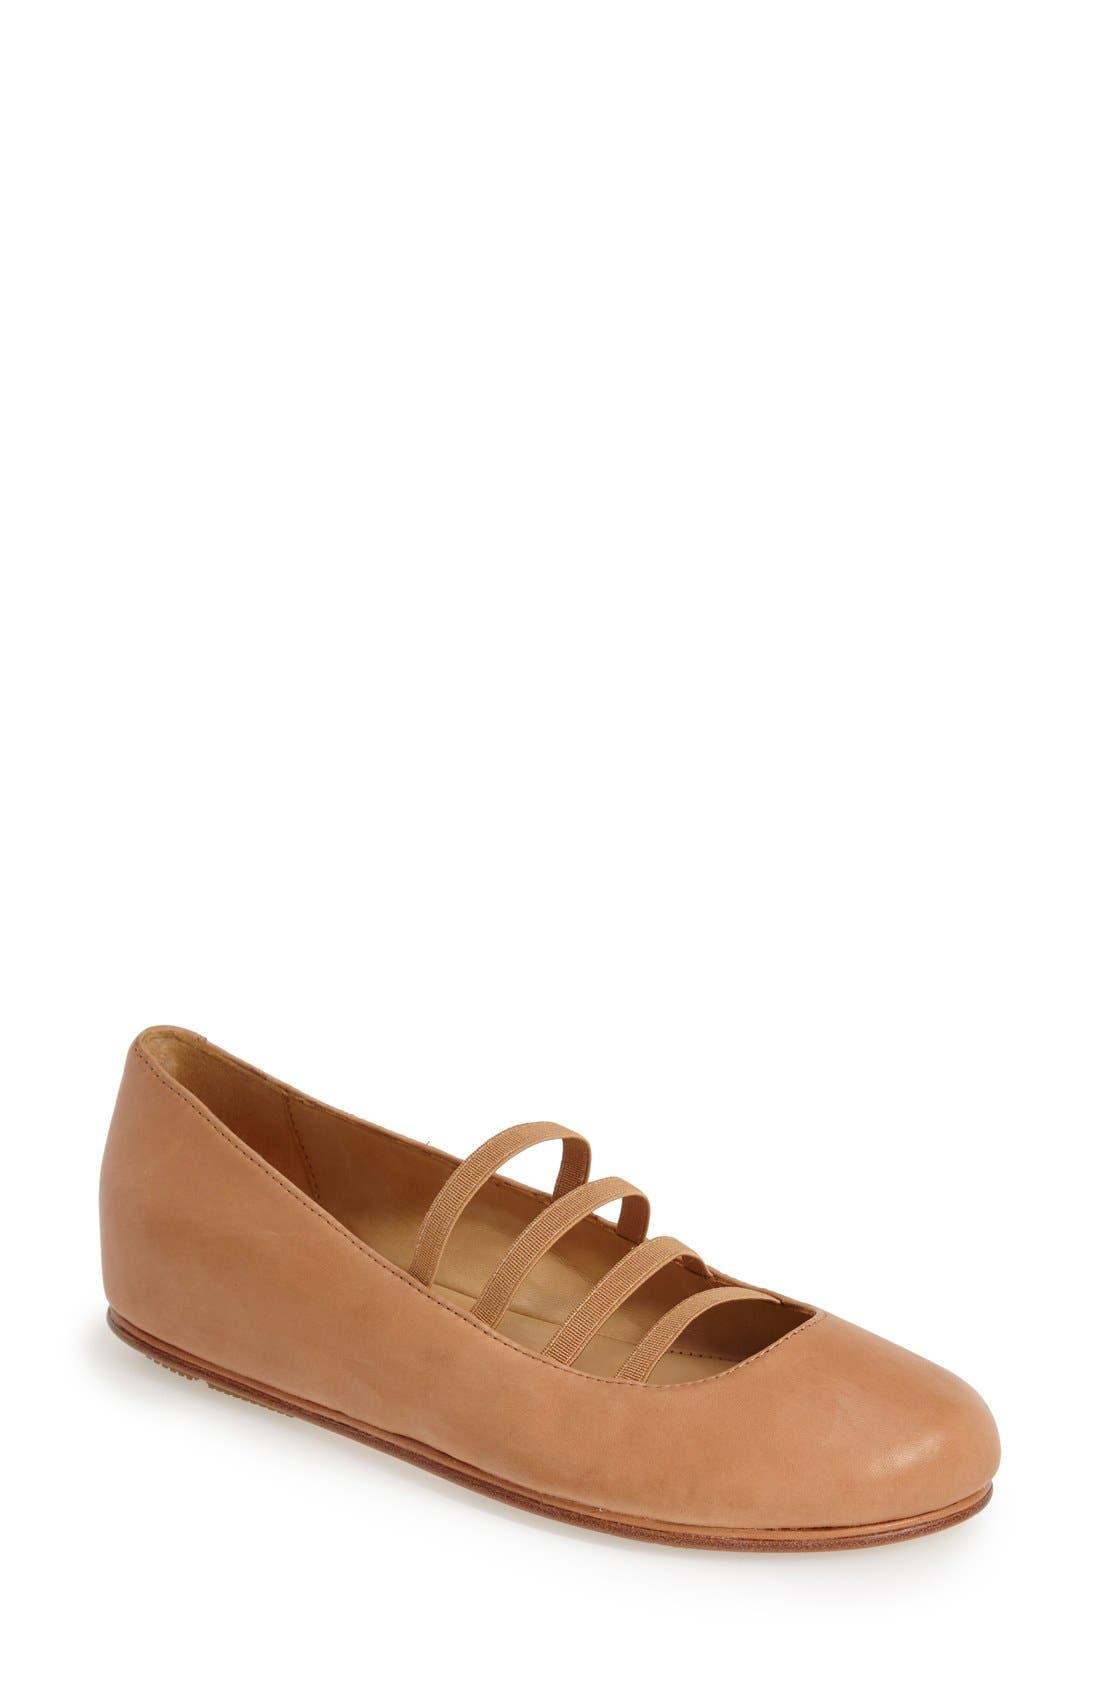 L'Amour des Pieds 'Caiden' Hidden Wedge Ballet Flat (Women)